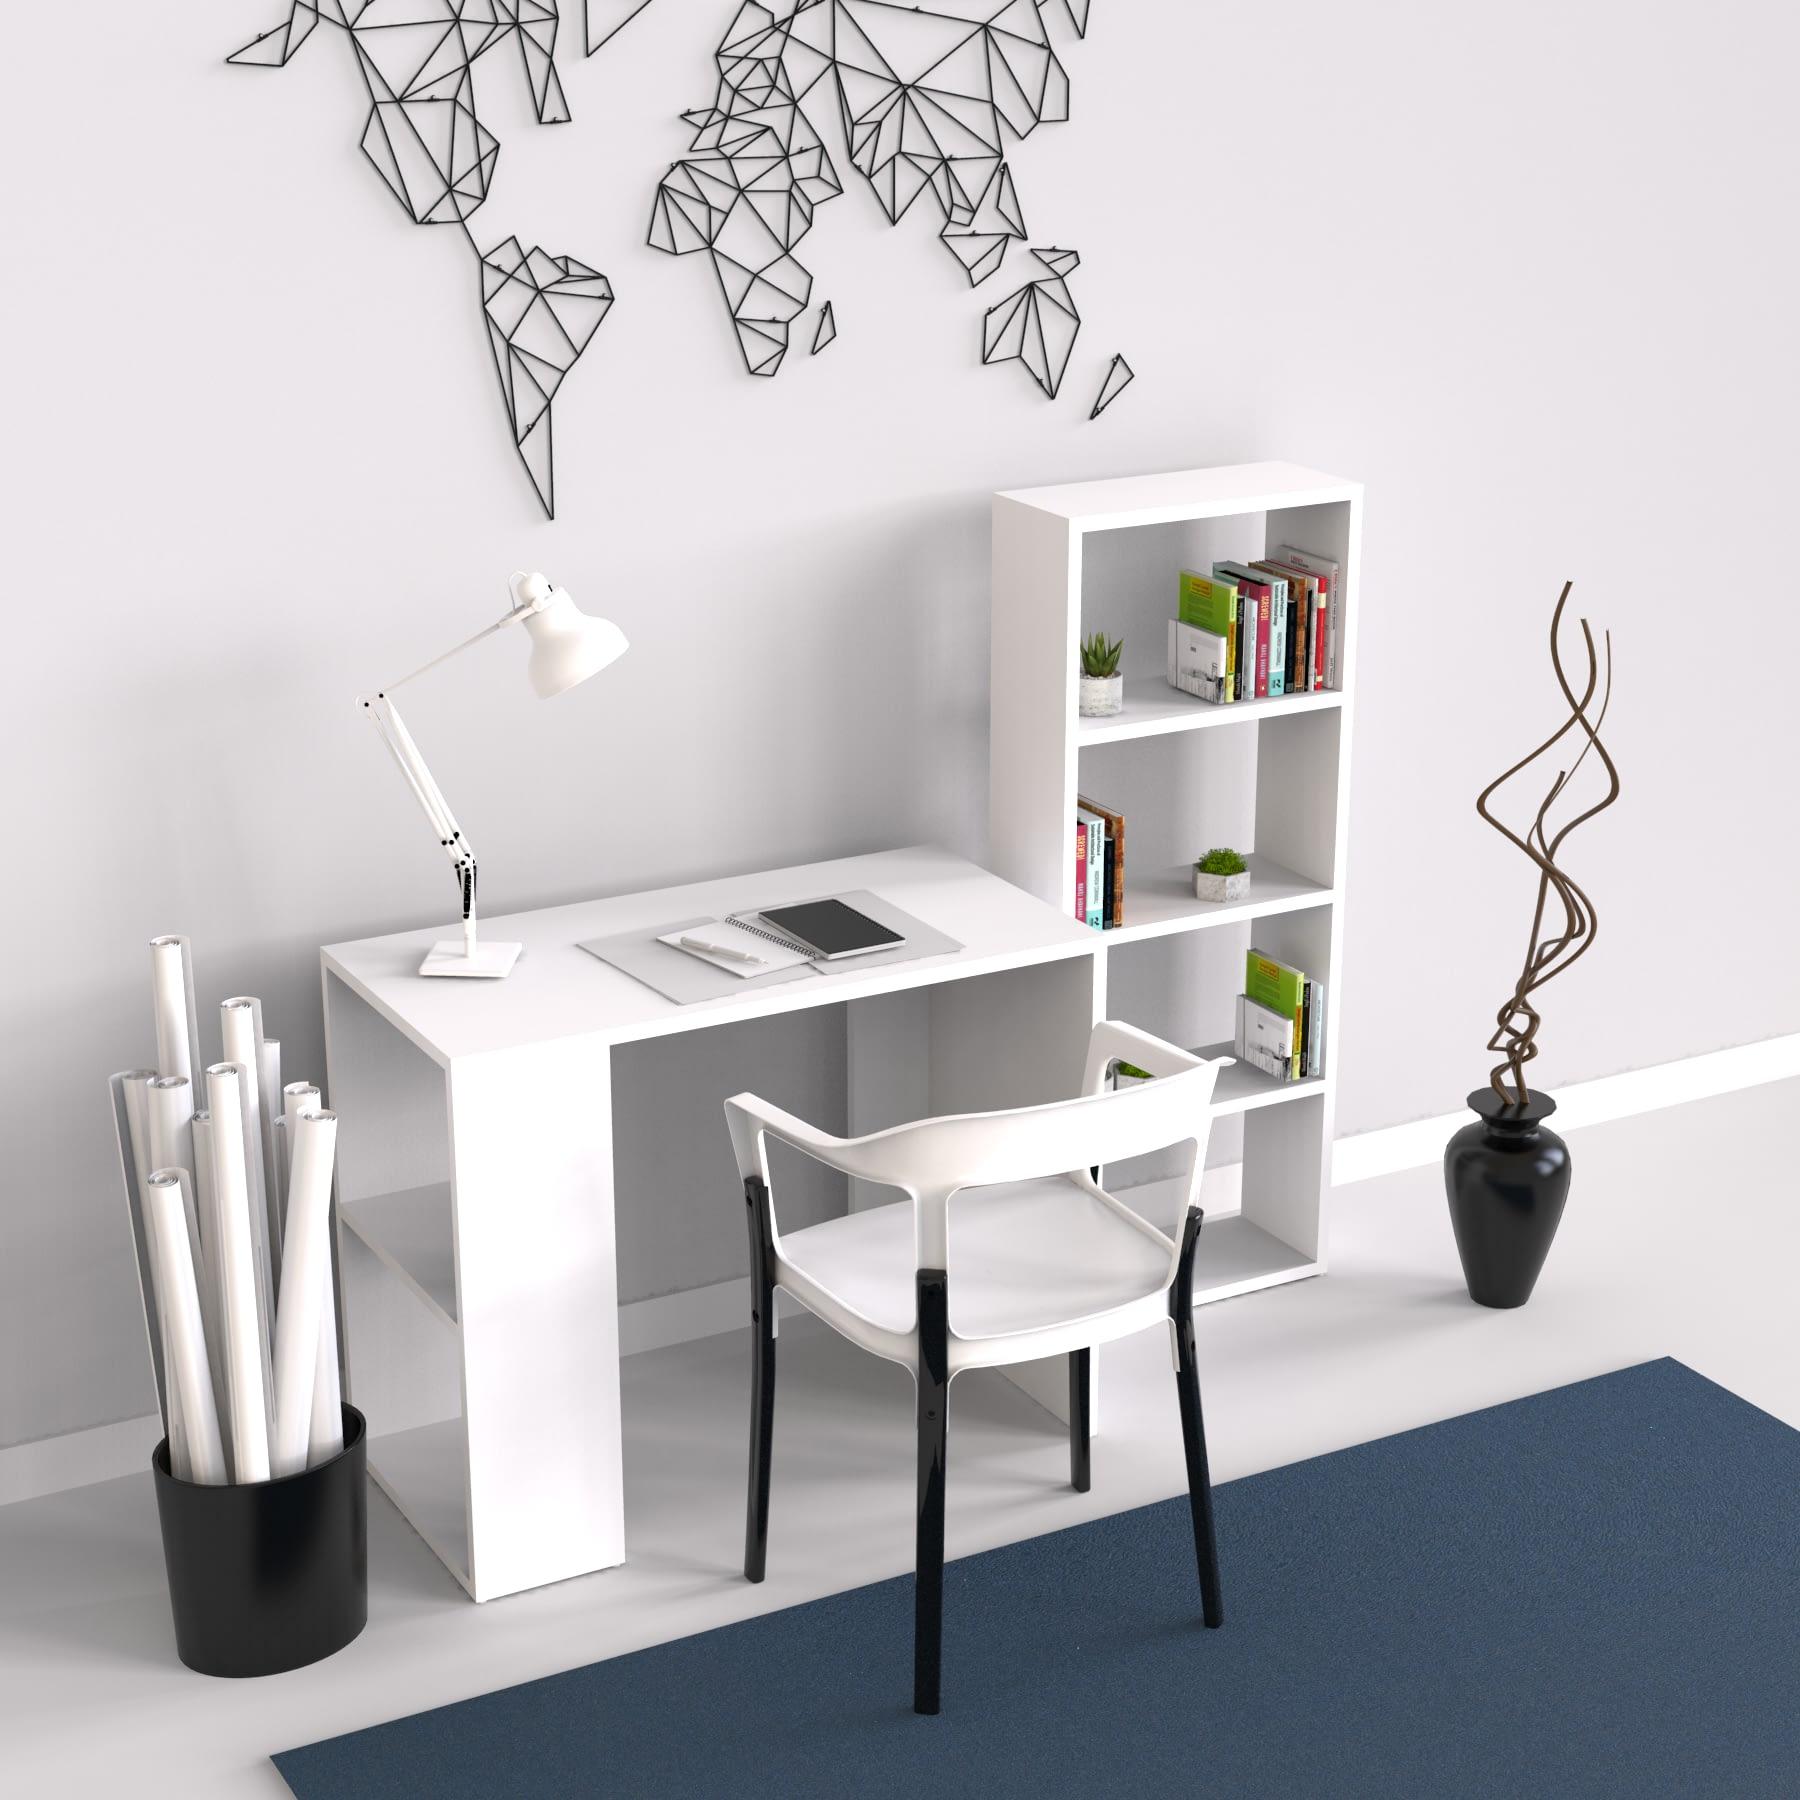 Mimilos M2K9 Study Desk